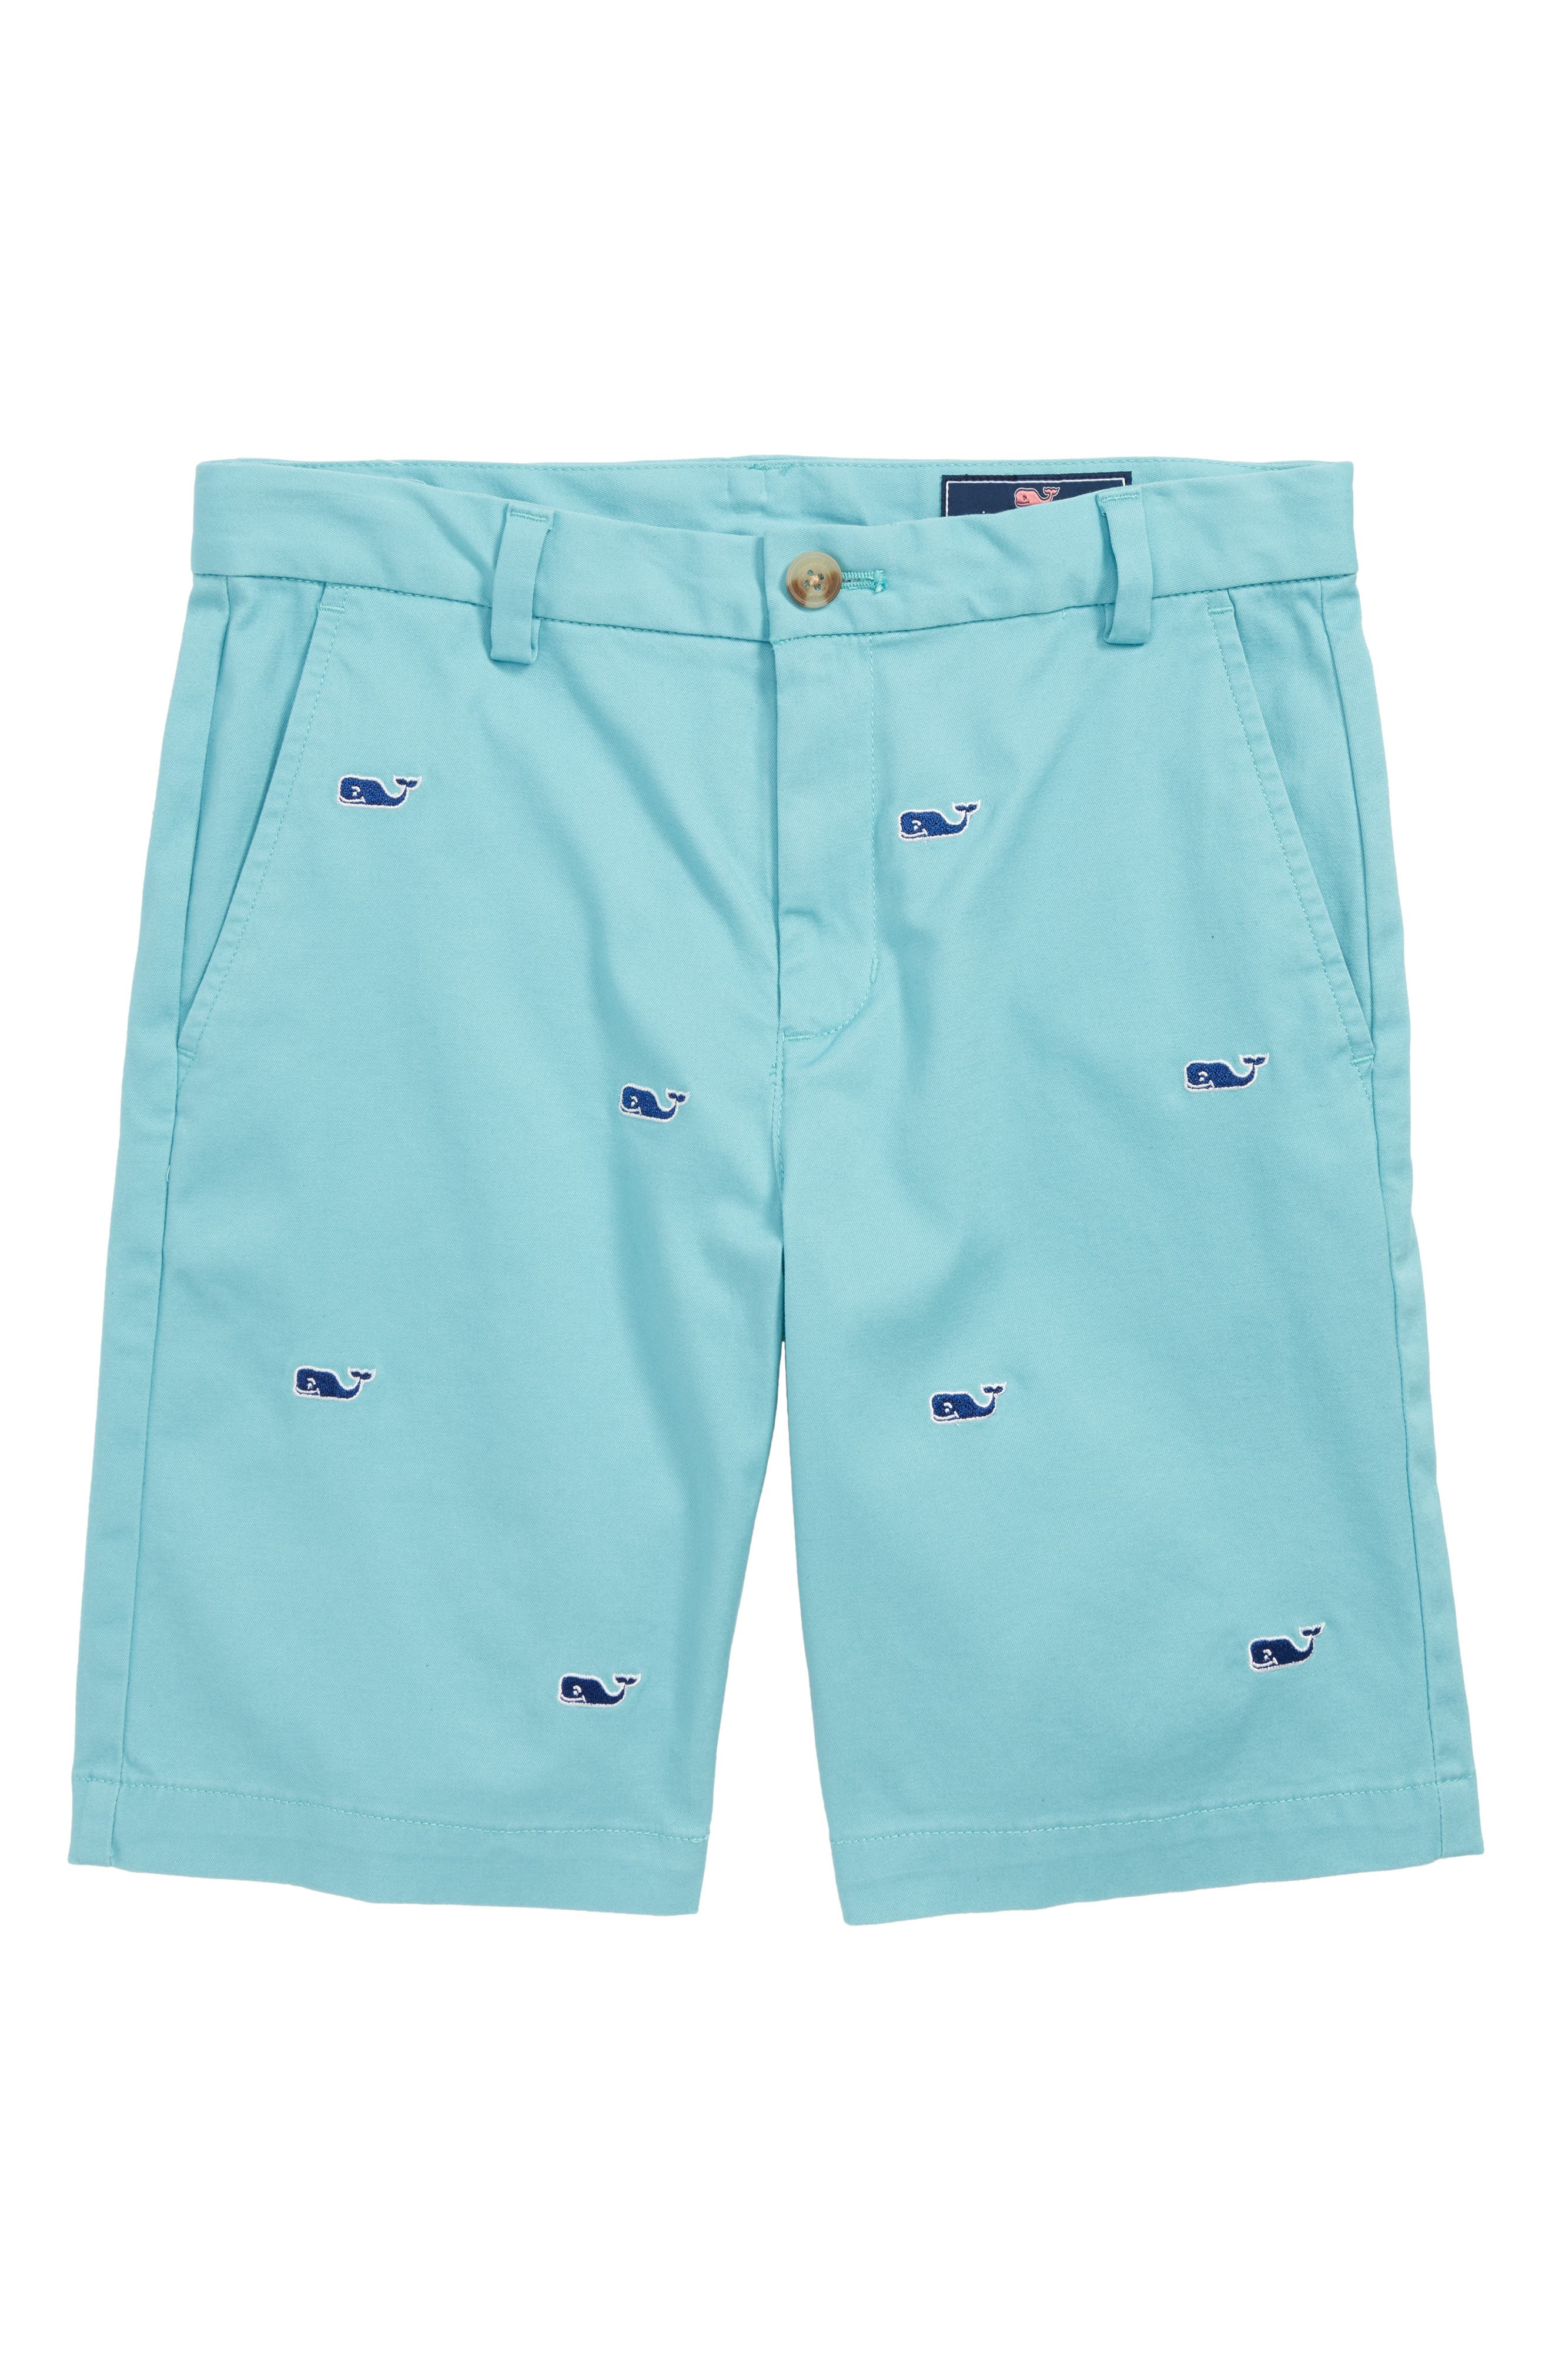 Embroidered Stretch Breaker Shorts,                         Main,                         color, Aqua Ocean